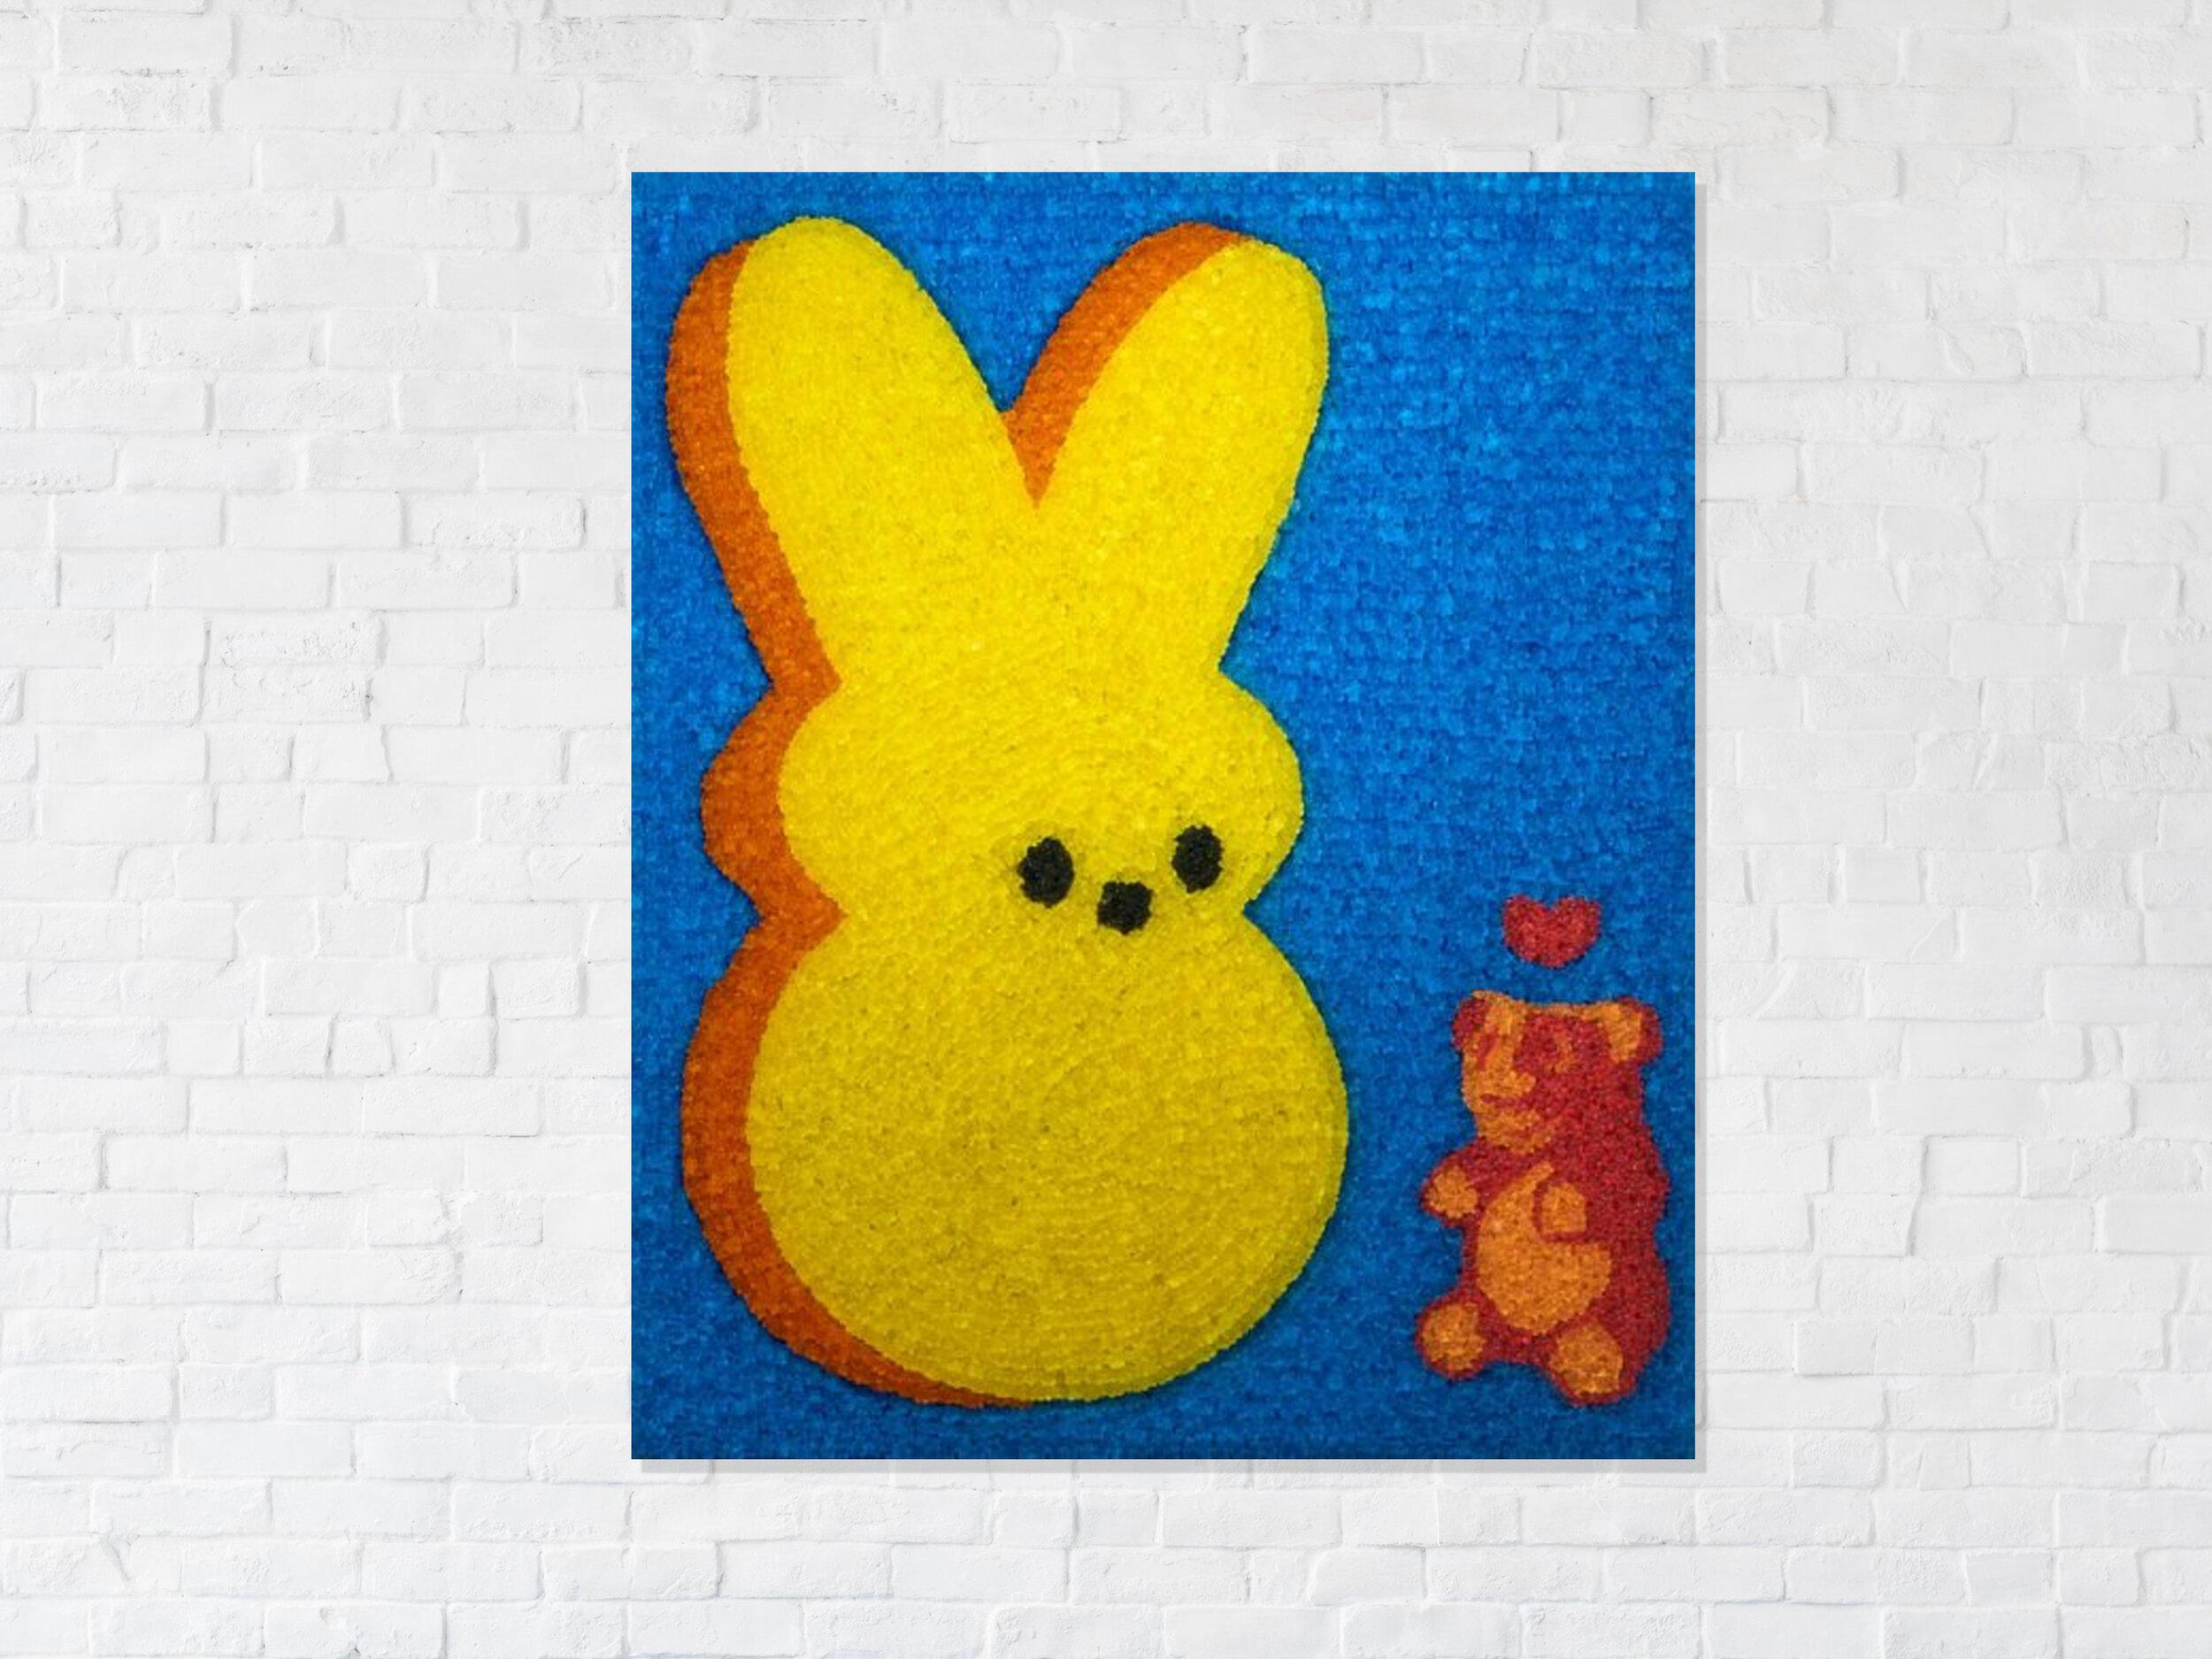 gummy love - 7,500 hand cast gummy bears